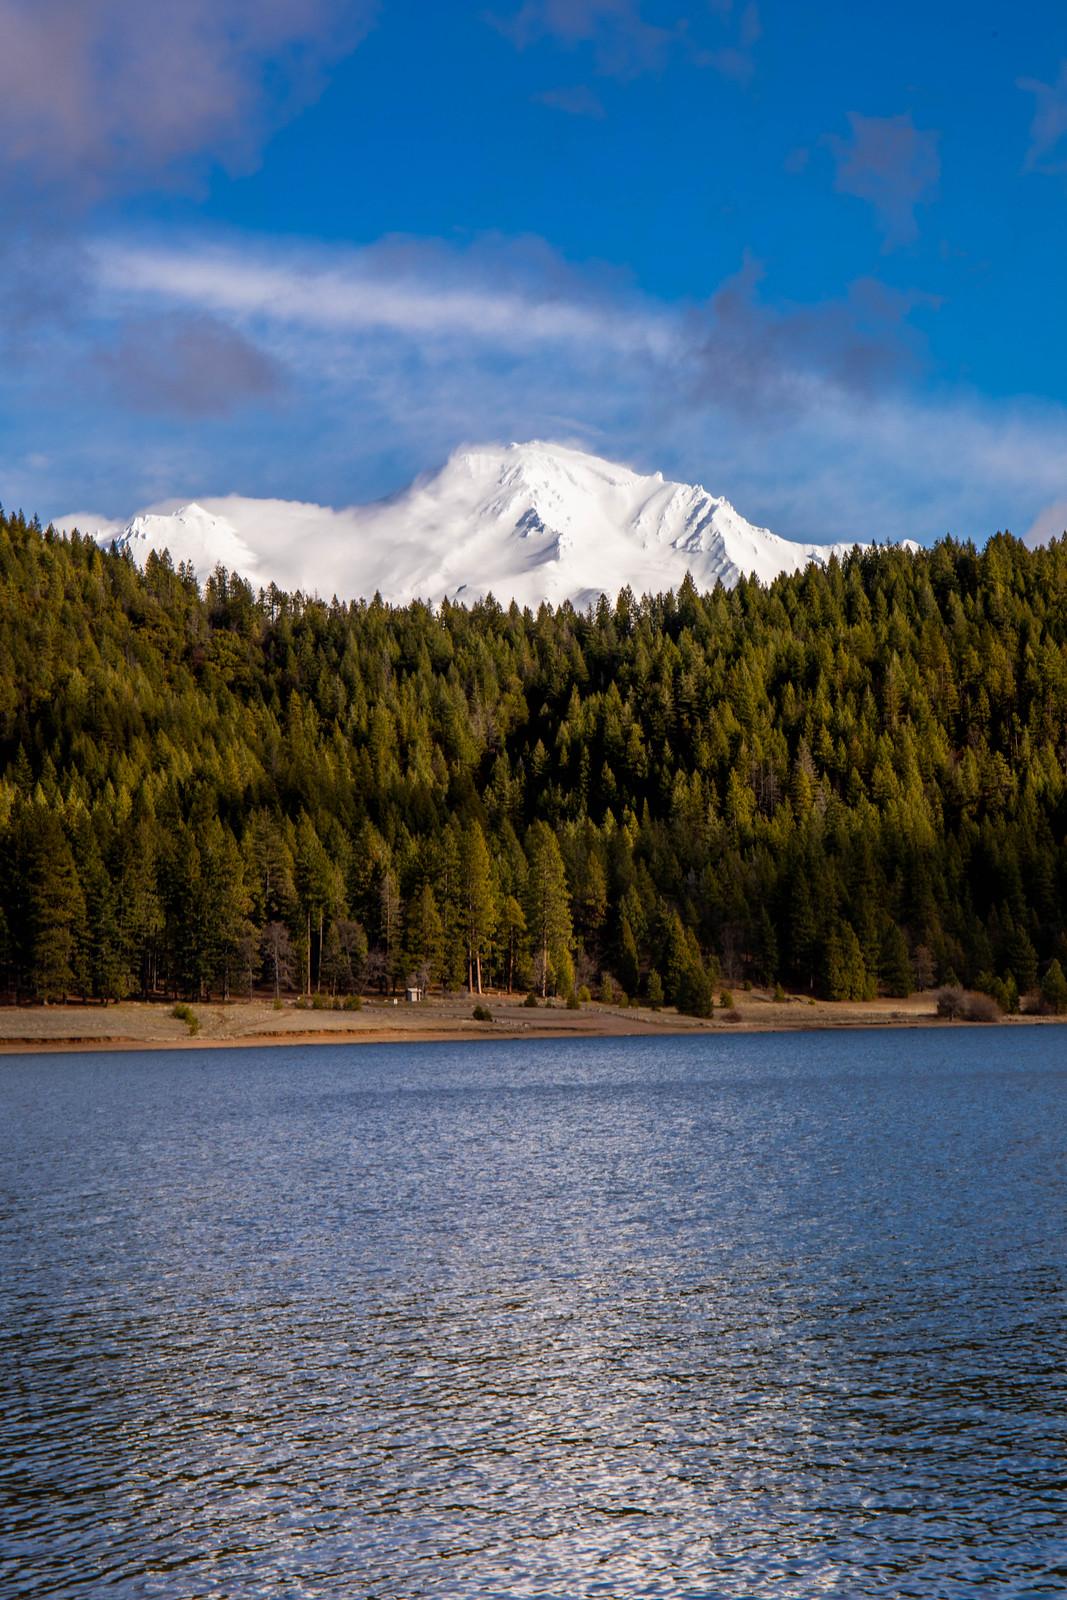 01.21. Mt. Shasta